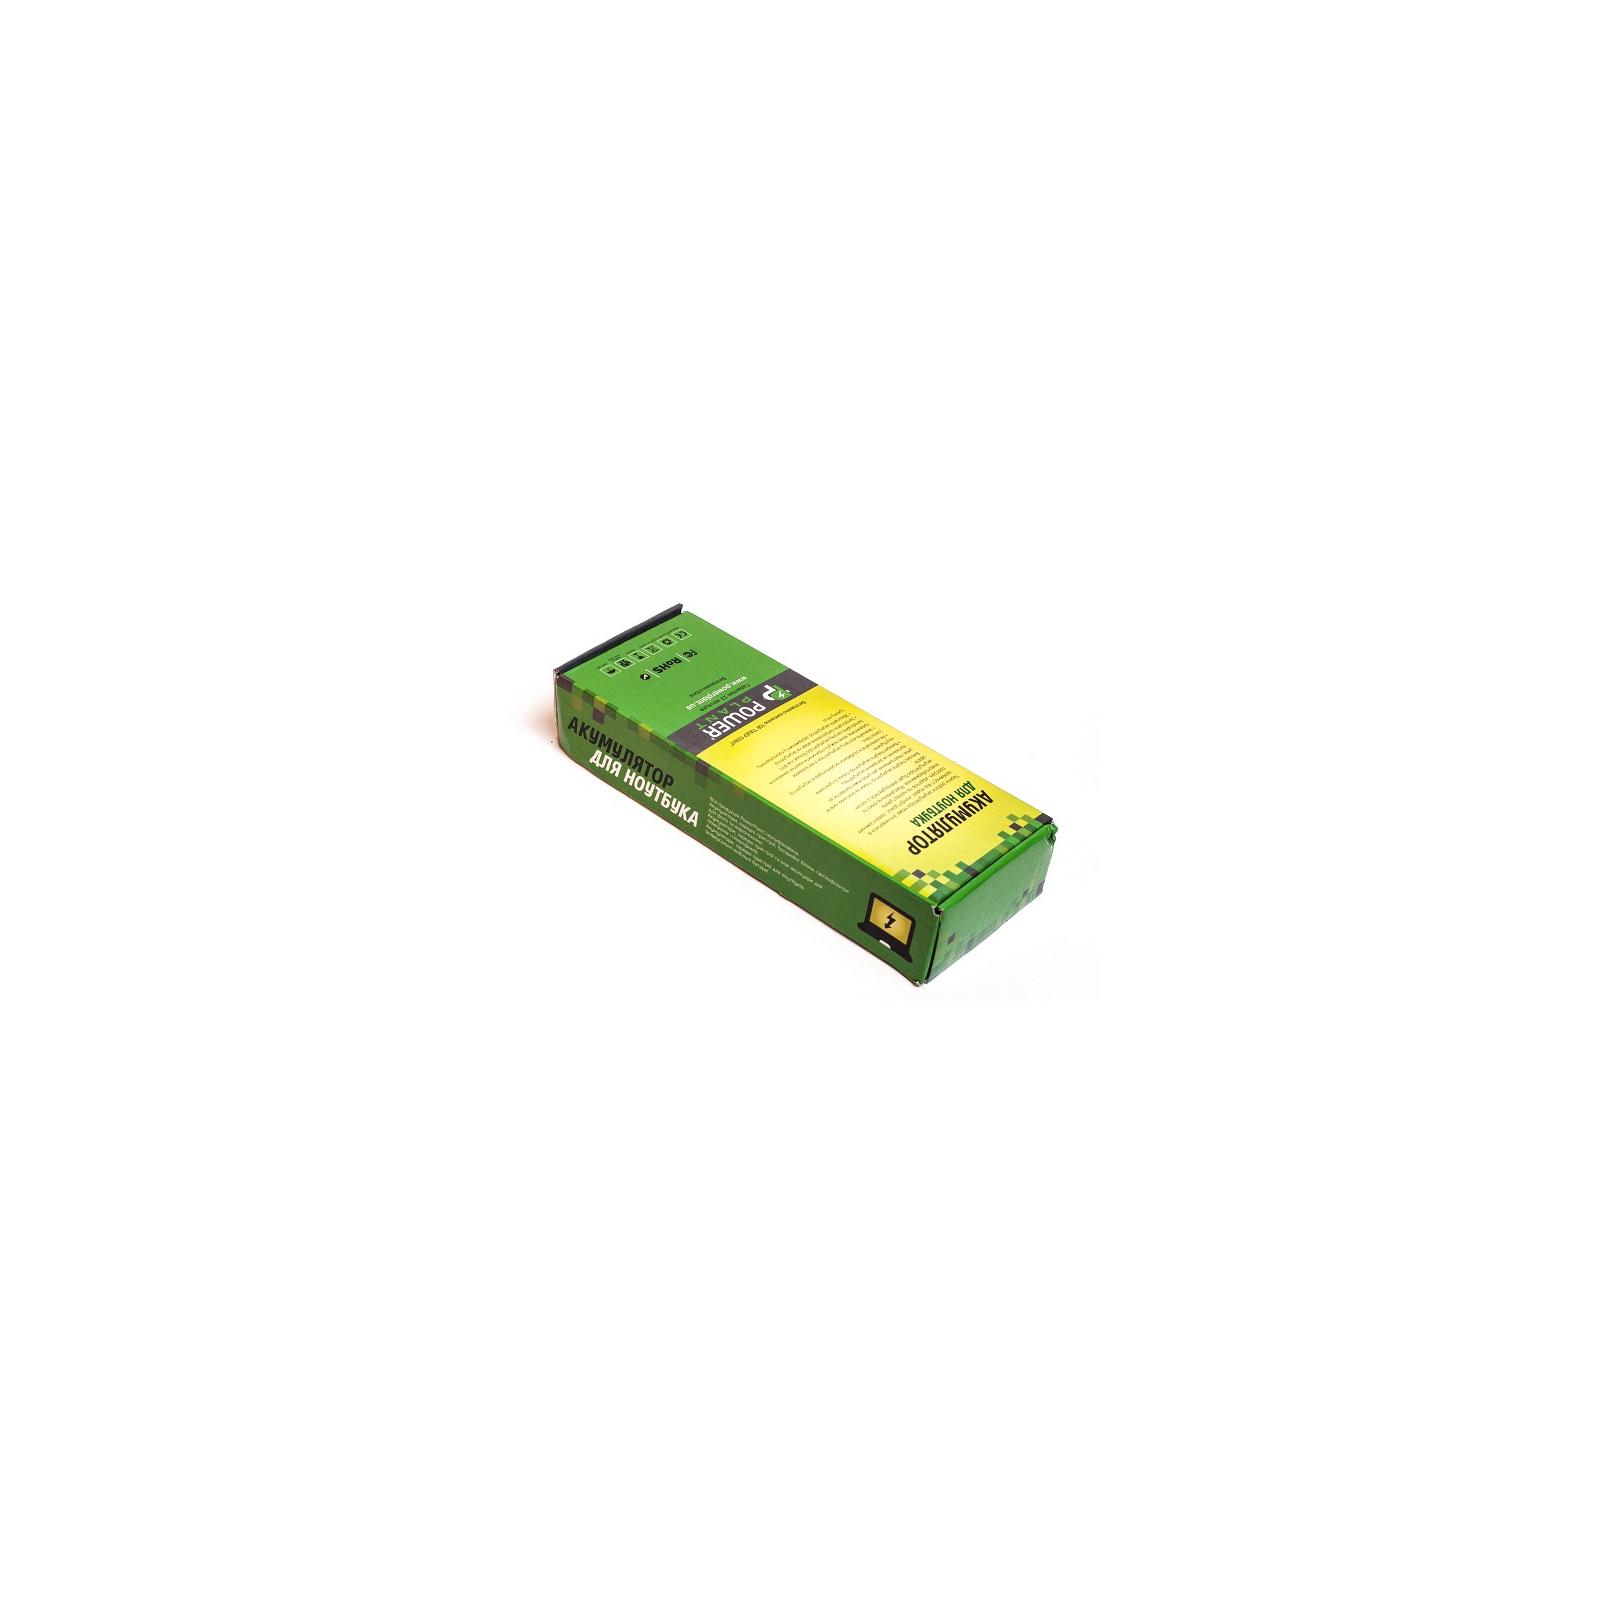 Аккумулятор для ноутбука ASUS X51H (A32-T12, AS5151LH) 11.1V 5200mAh PowerPlant (NB00000011) изображение 2